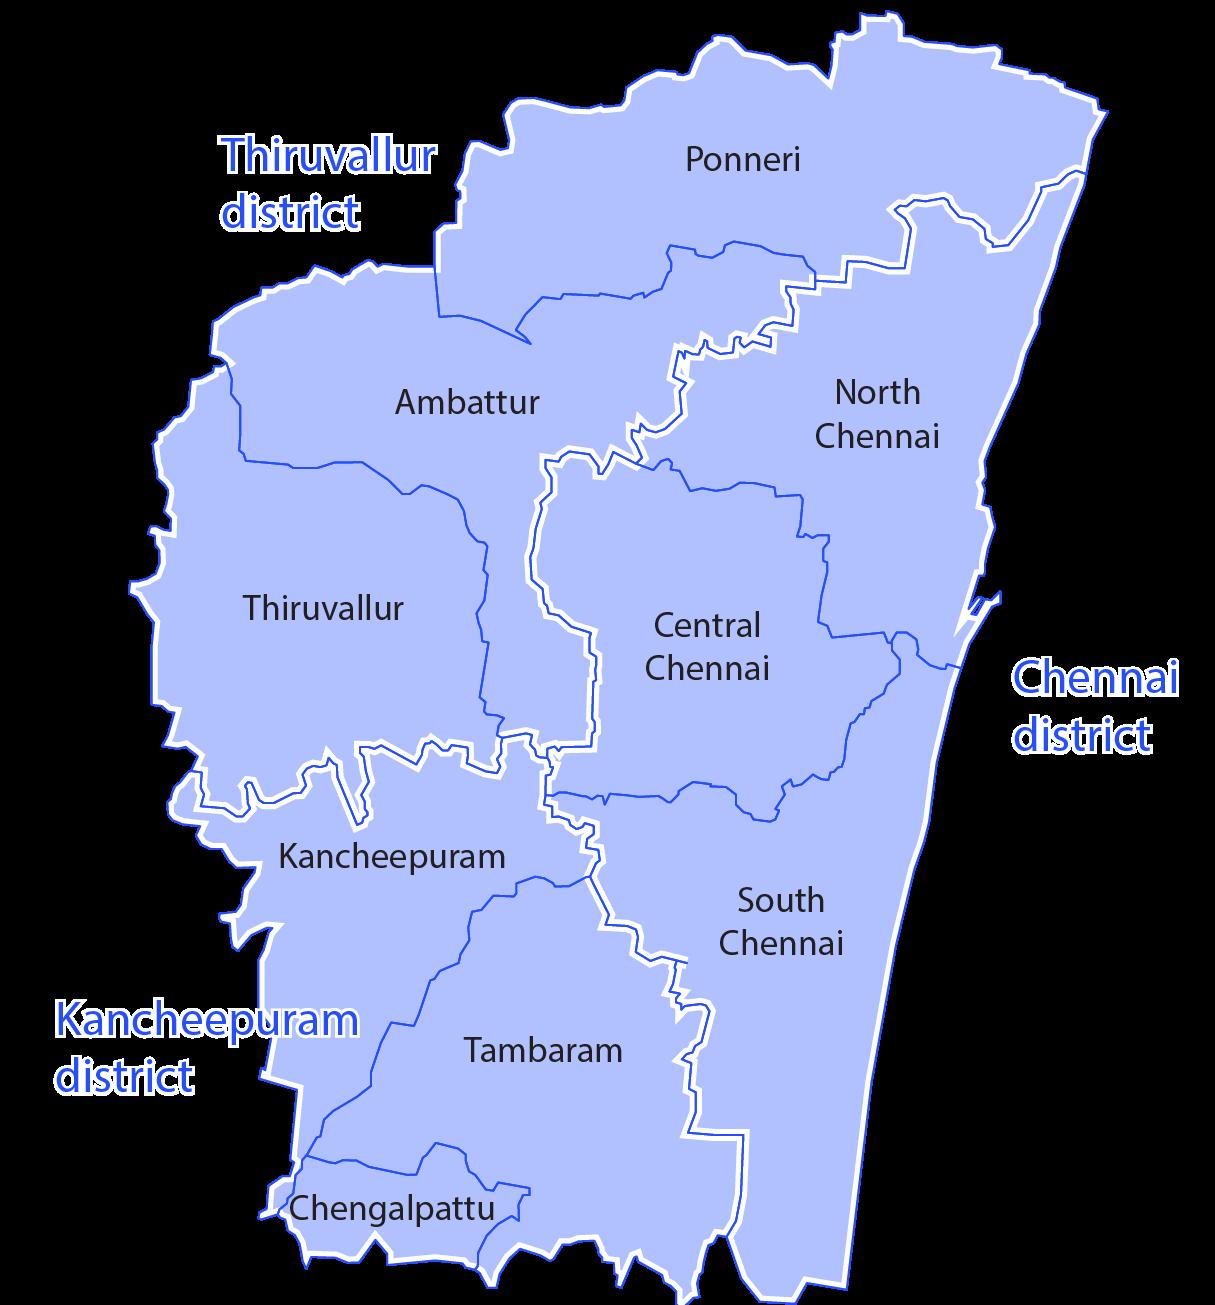 Speculation on Property in Chennai: Location Thaiyur